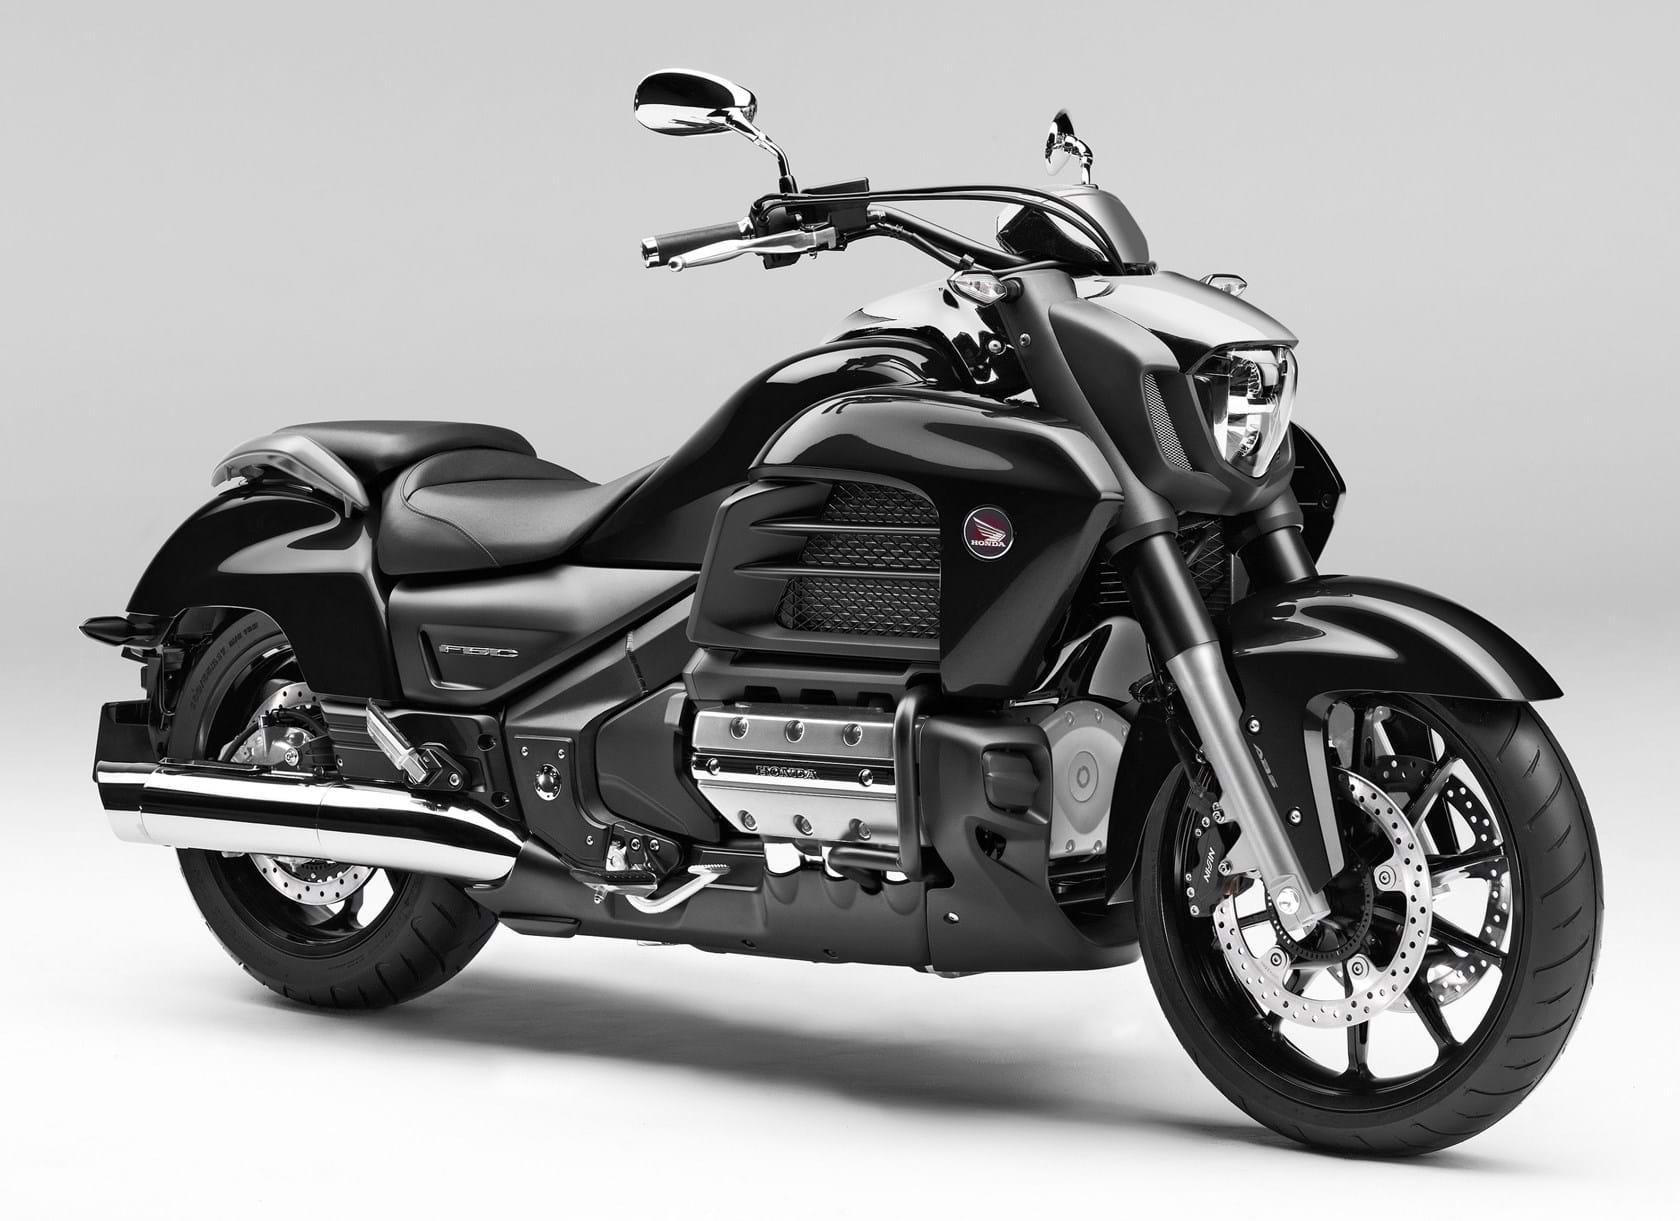 For Sale Honda Valkyrie F6c The Bike Market Headlight Wiring Diagram